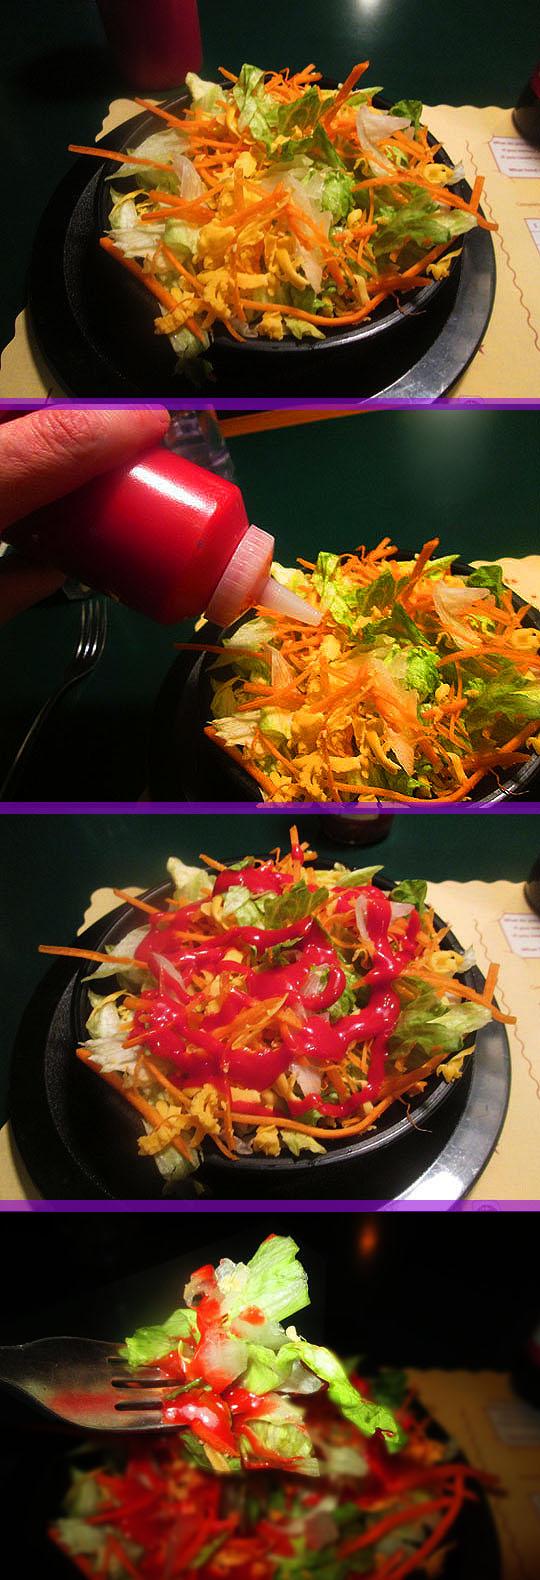 8. salad_march13-18.jpg